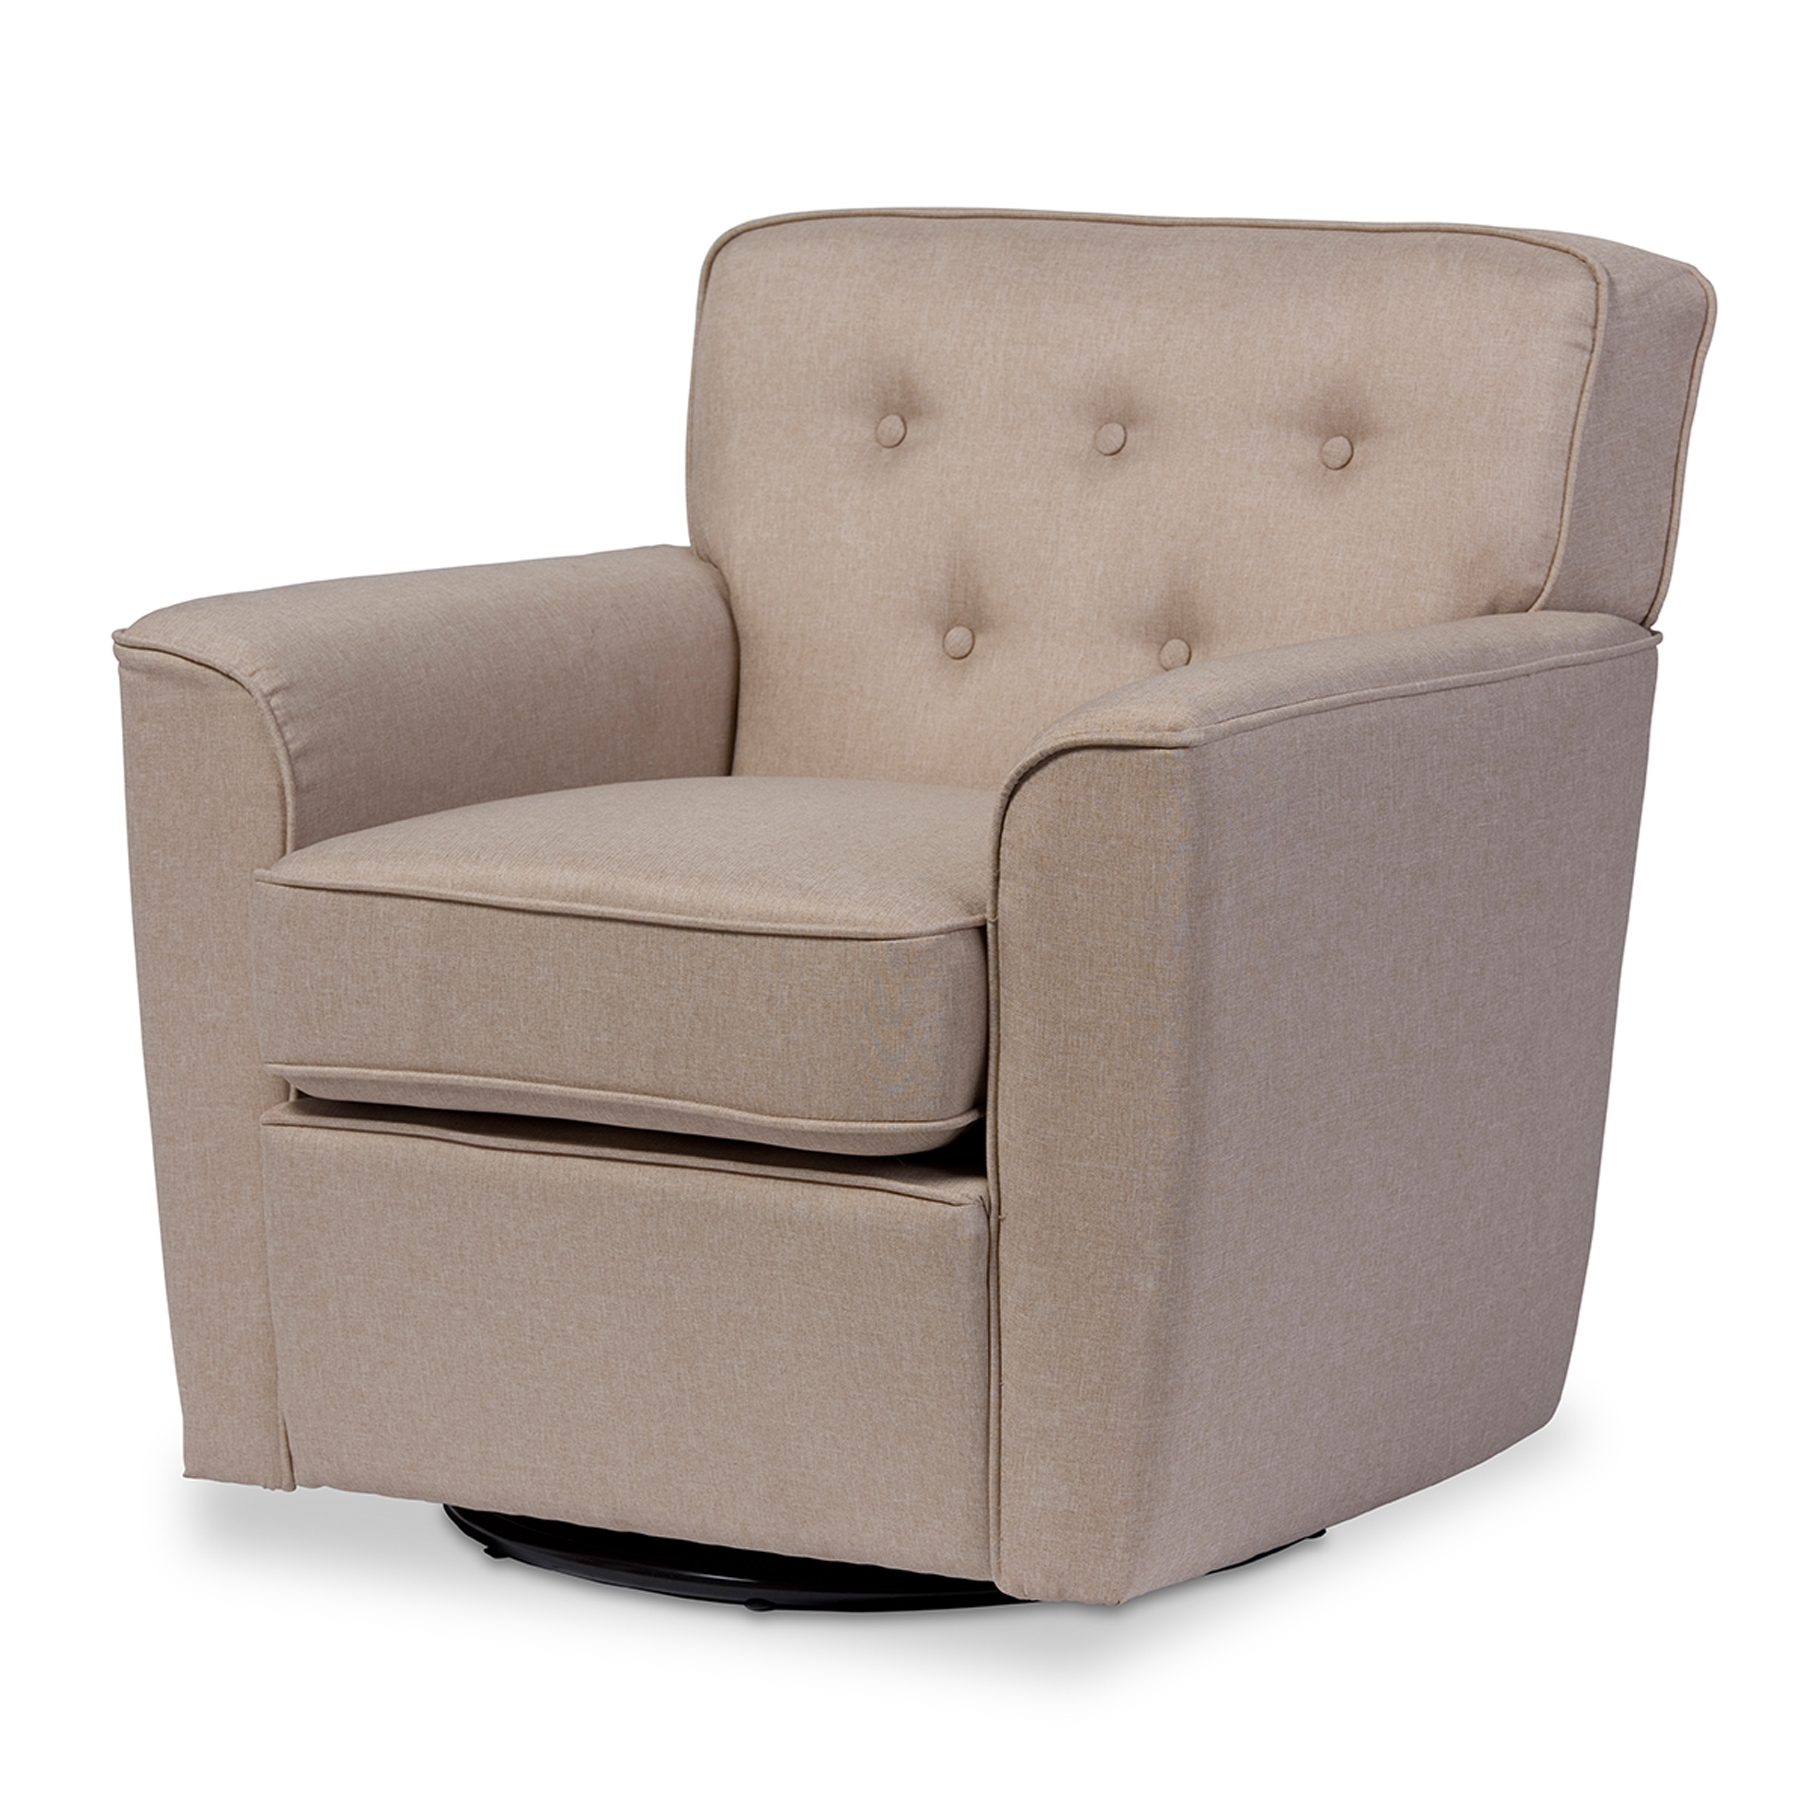 baxton studio canberra modern retro contemporary beige fabric